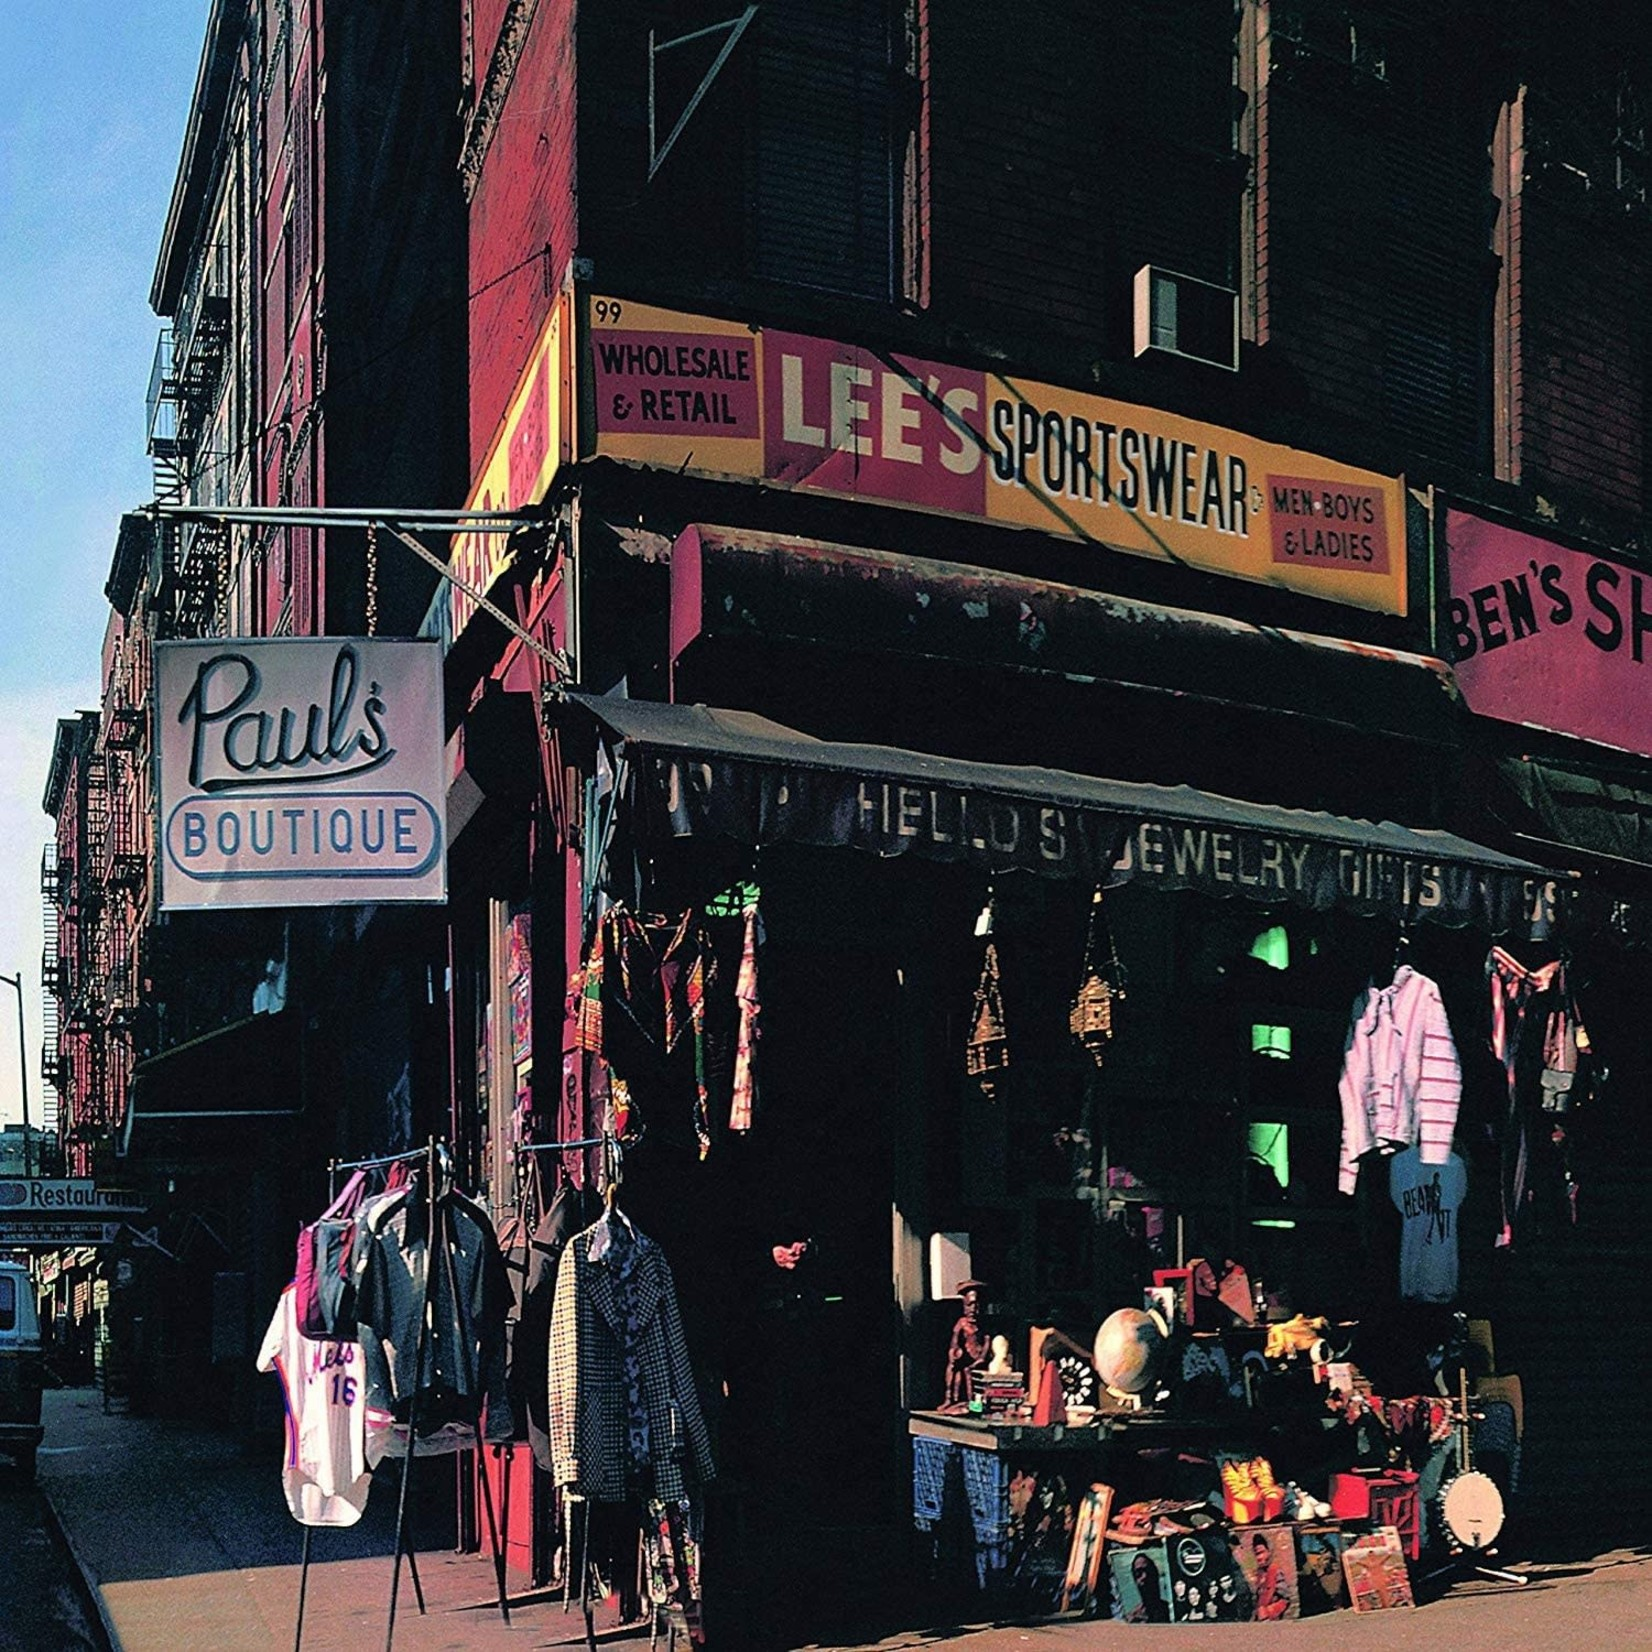 [New] Beastie Boys: Paul's Boutique (2LP, 30th Anniversary Ed.)